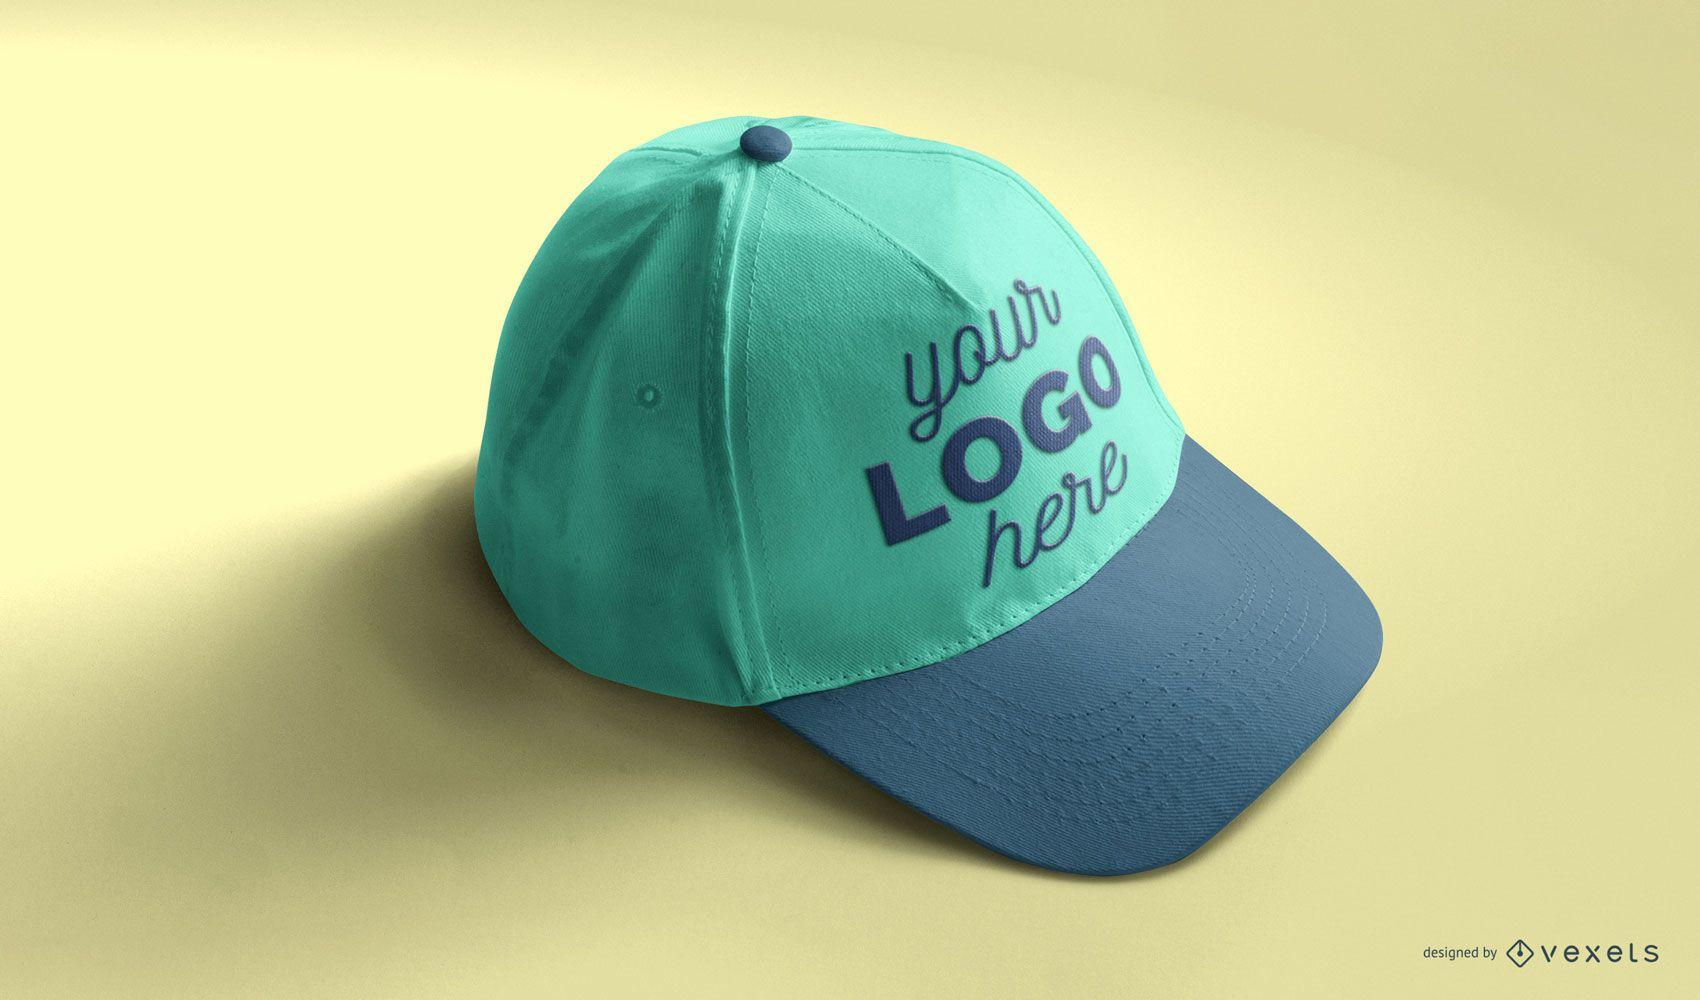 Maqueta de gorra de béisbol